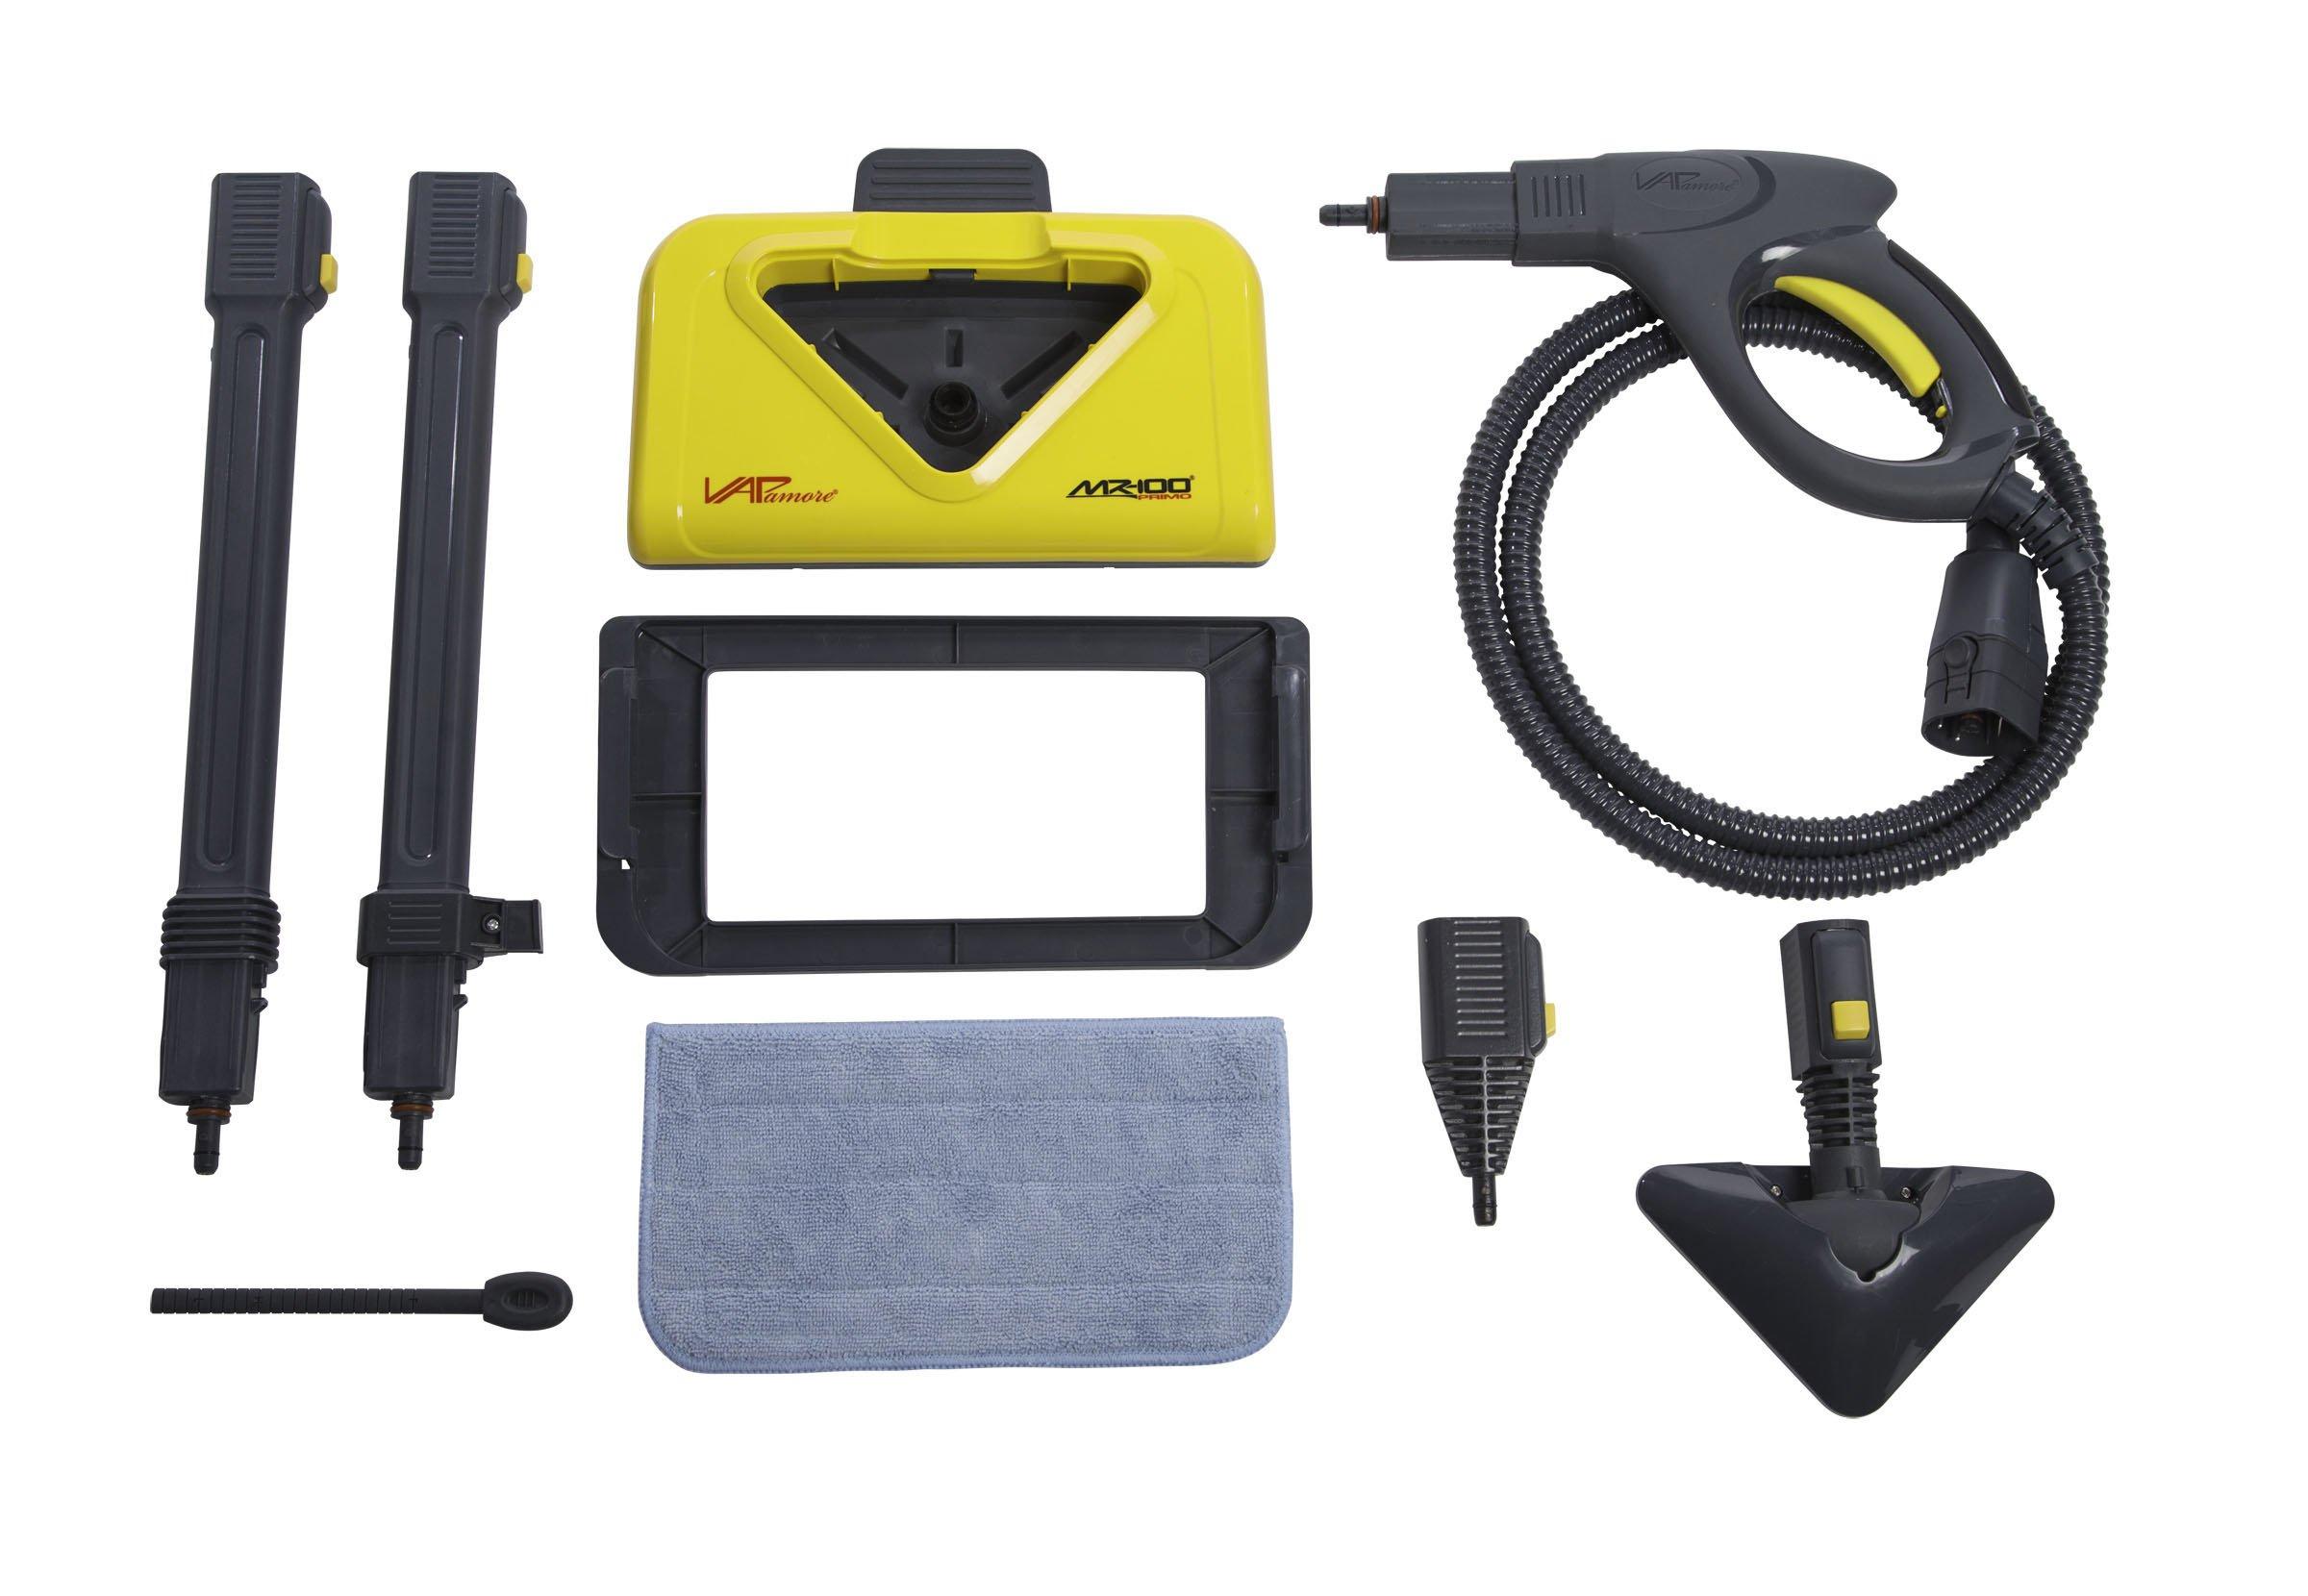 Vapamore MR-100 Primo Upgrade Pack by Vapamore